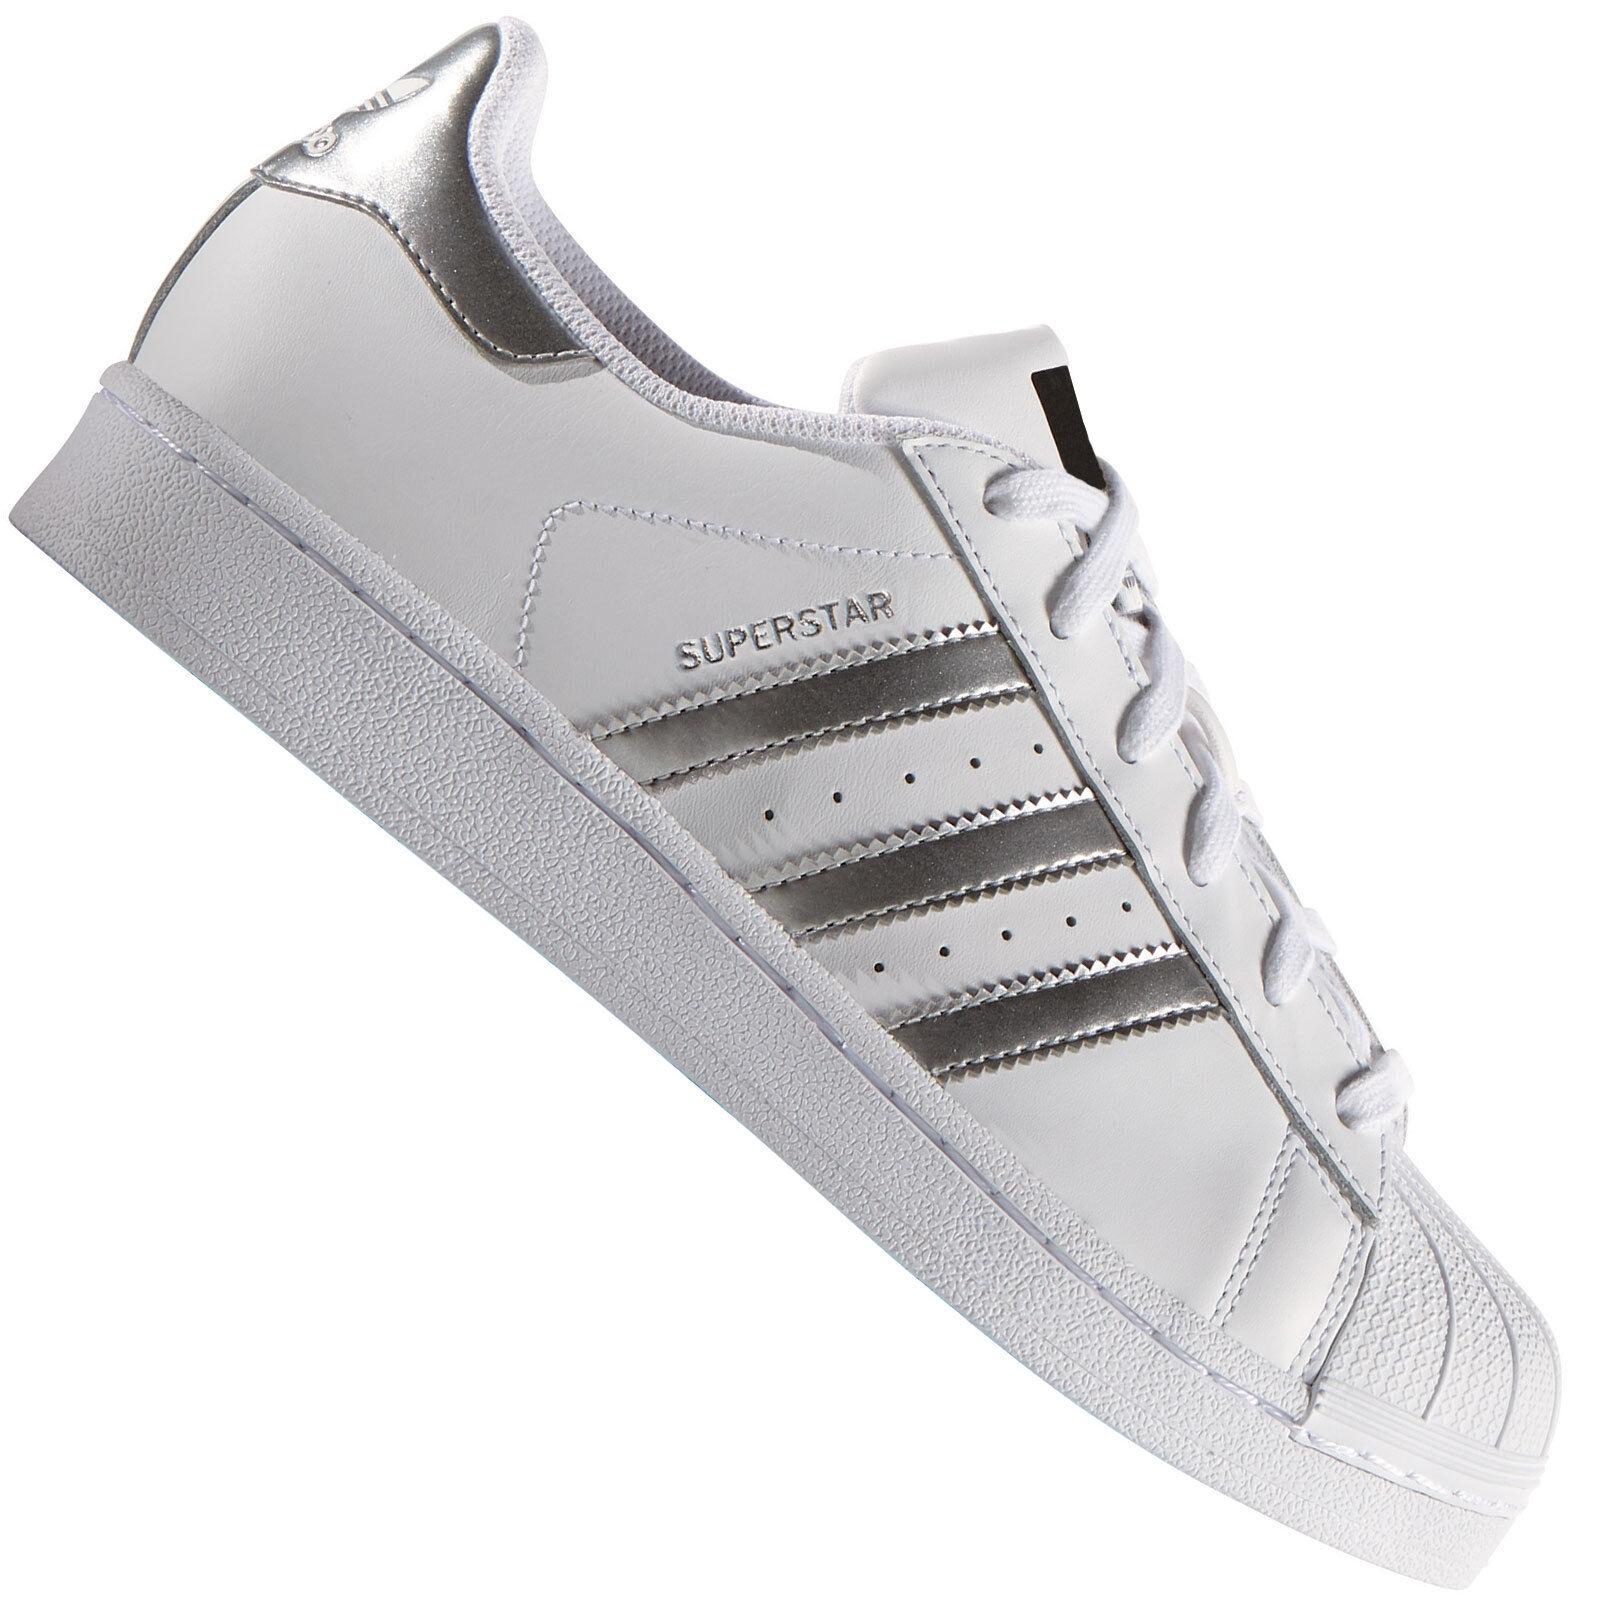 Adidas Originals Superstar Sneaker women Bianco silver AQ3091 shoes da